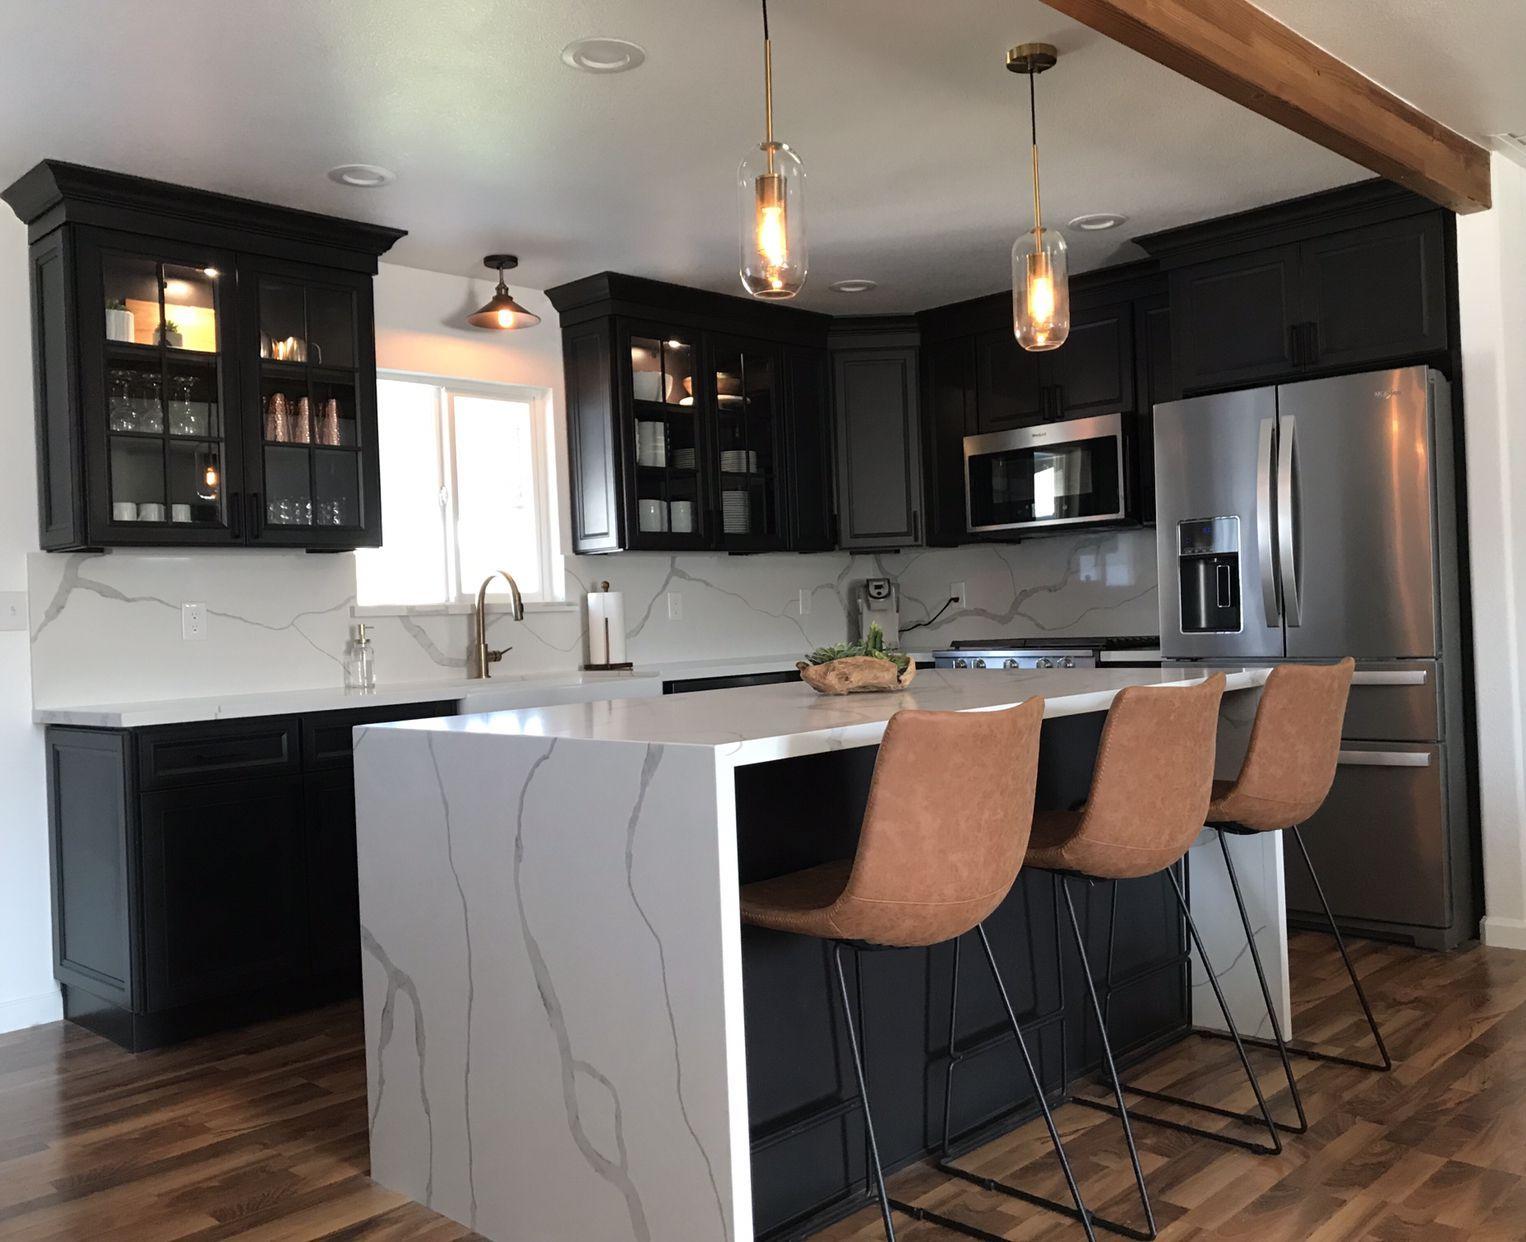 Kitchen waterfallcountertop Stone kitchen island